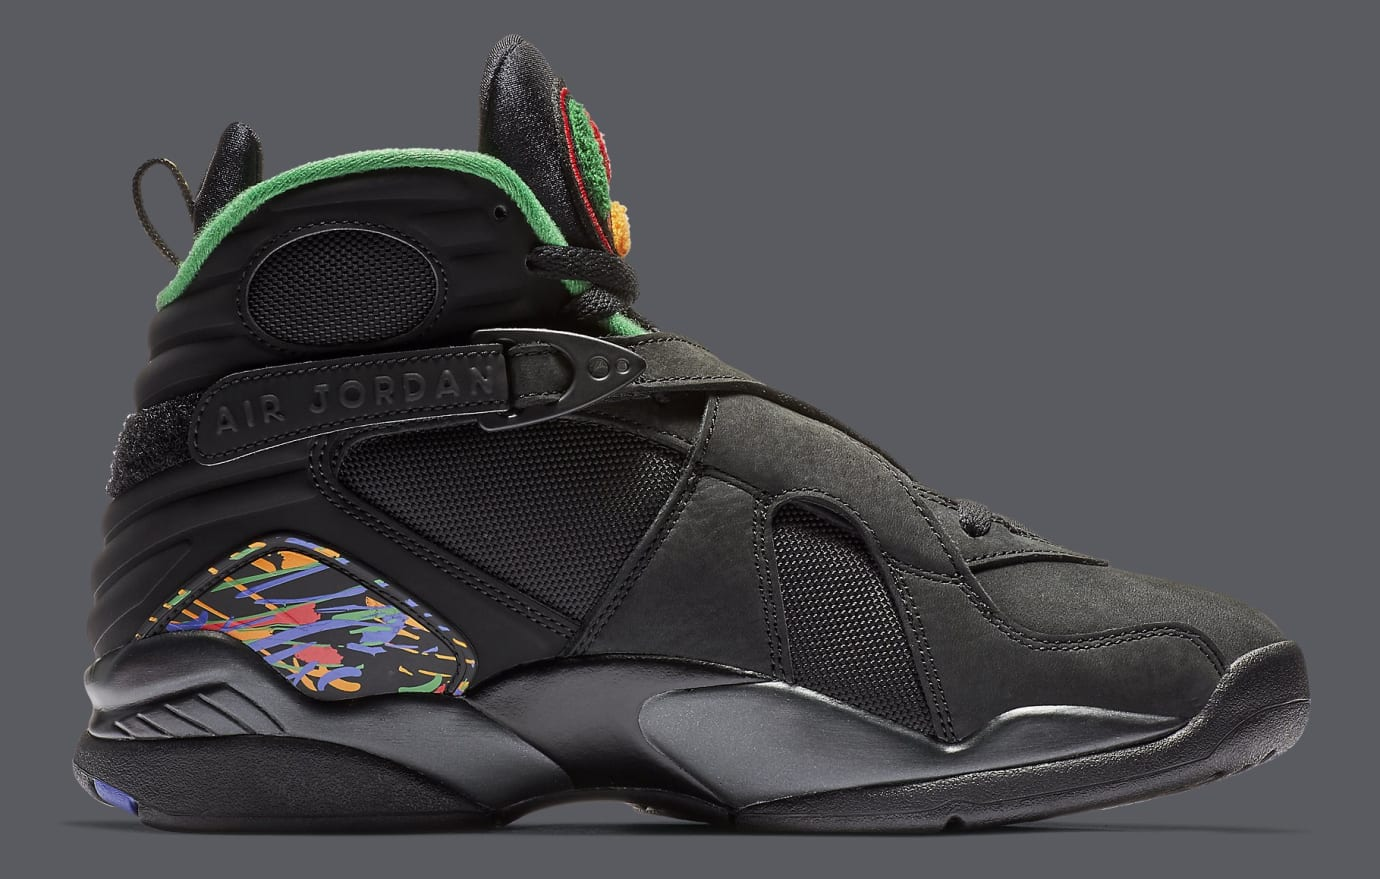 061ab22ae78 Image via Nike Air Jordan 8 VIII Tinker Air Raid Release Date 305381-004  Medial